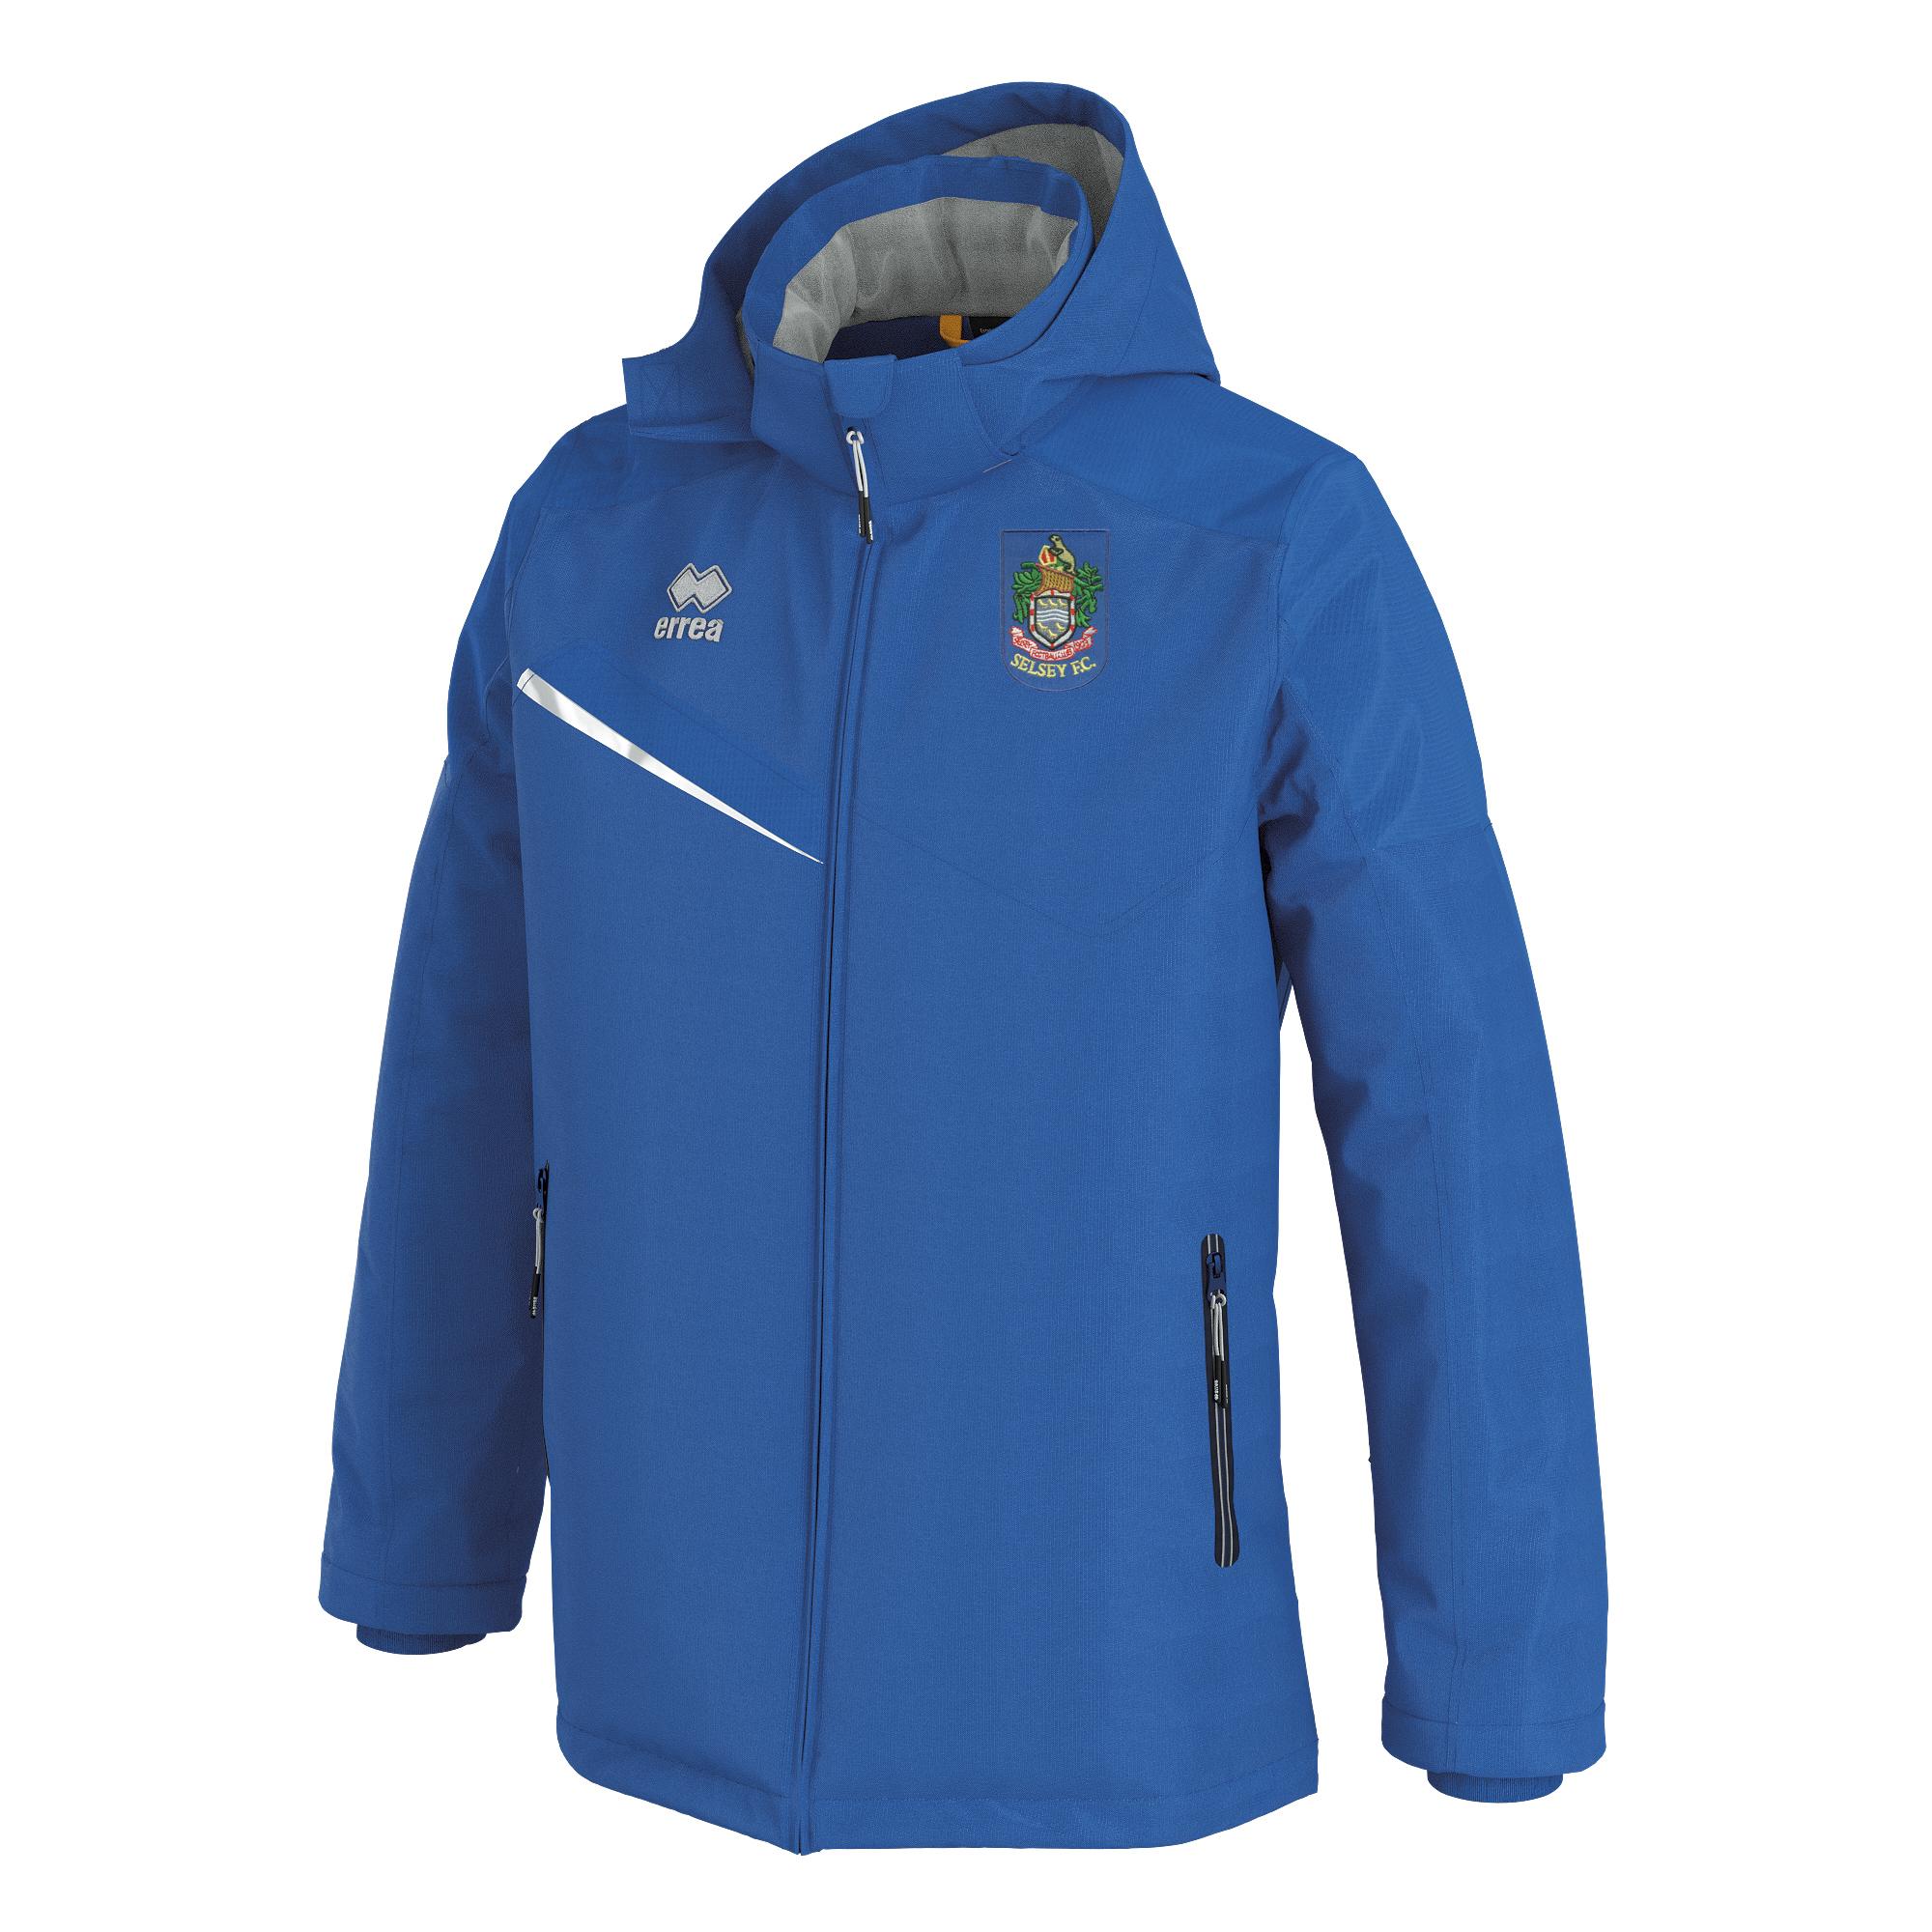 Selsey FC Errea Iceland 3 Winter Jacket Blue